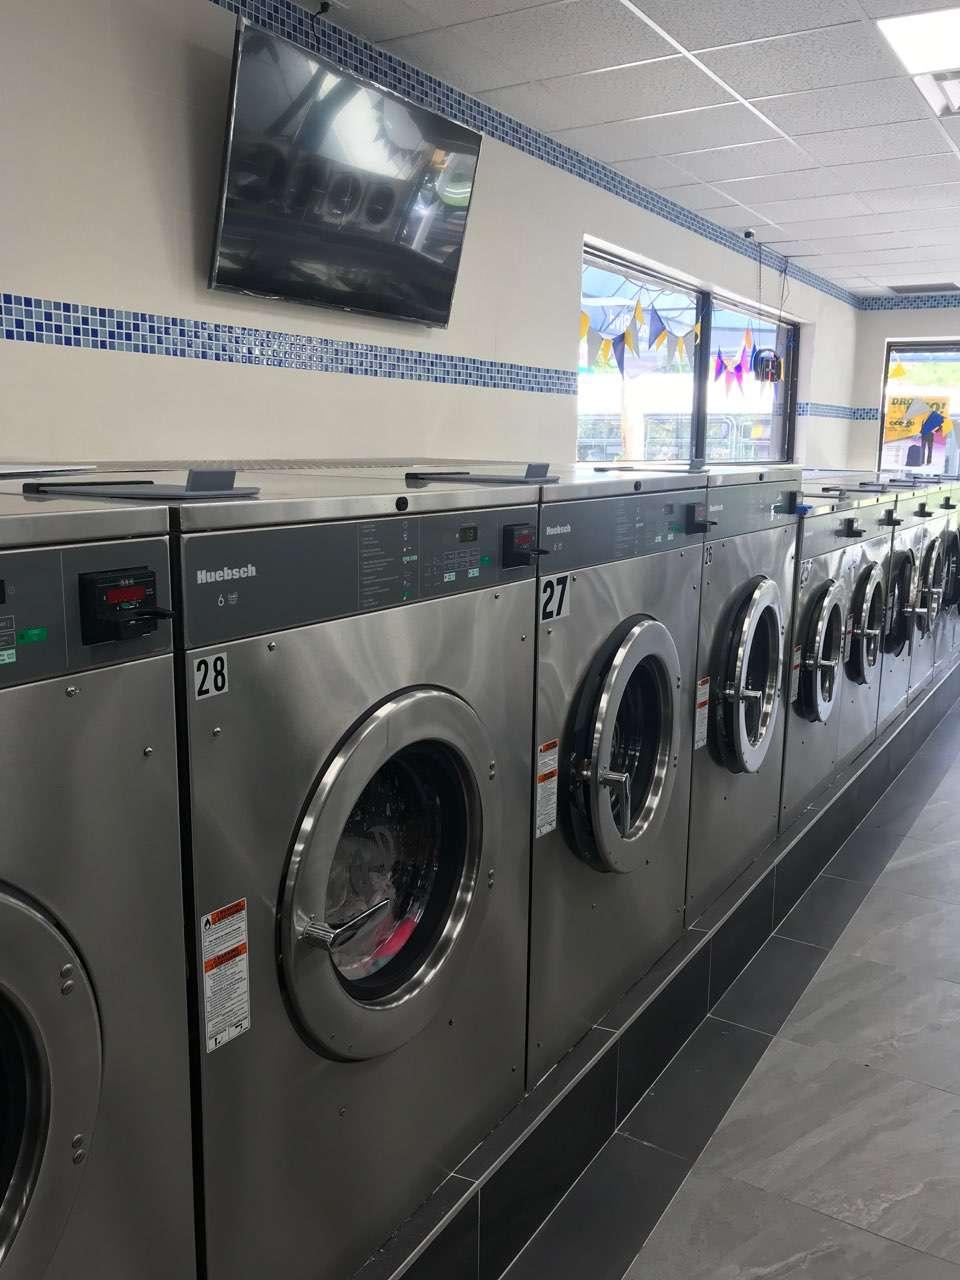 Cross Island Laundromat - laundry  | Photo 1 of 2 | Address: 234-20 Linden Blvd, Cambria Heights, NY 11411, USA | Phone: (718) 525-0012